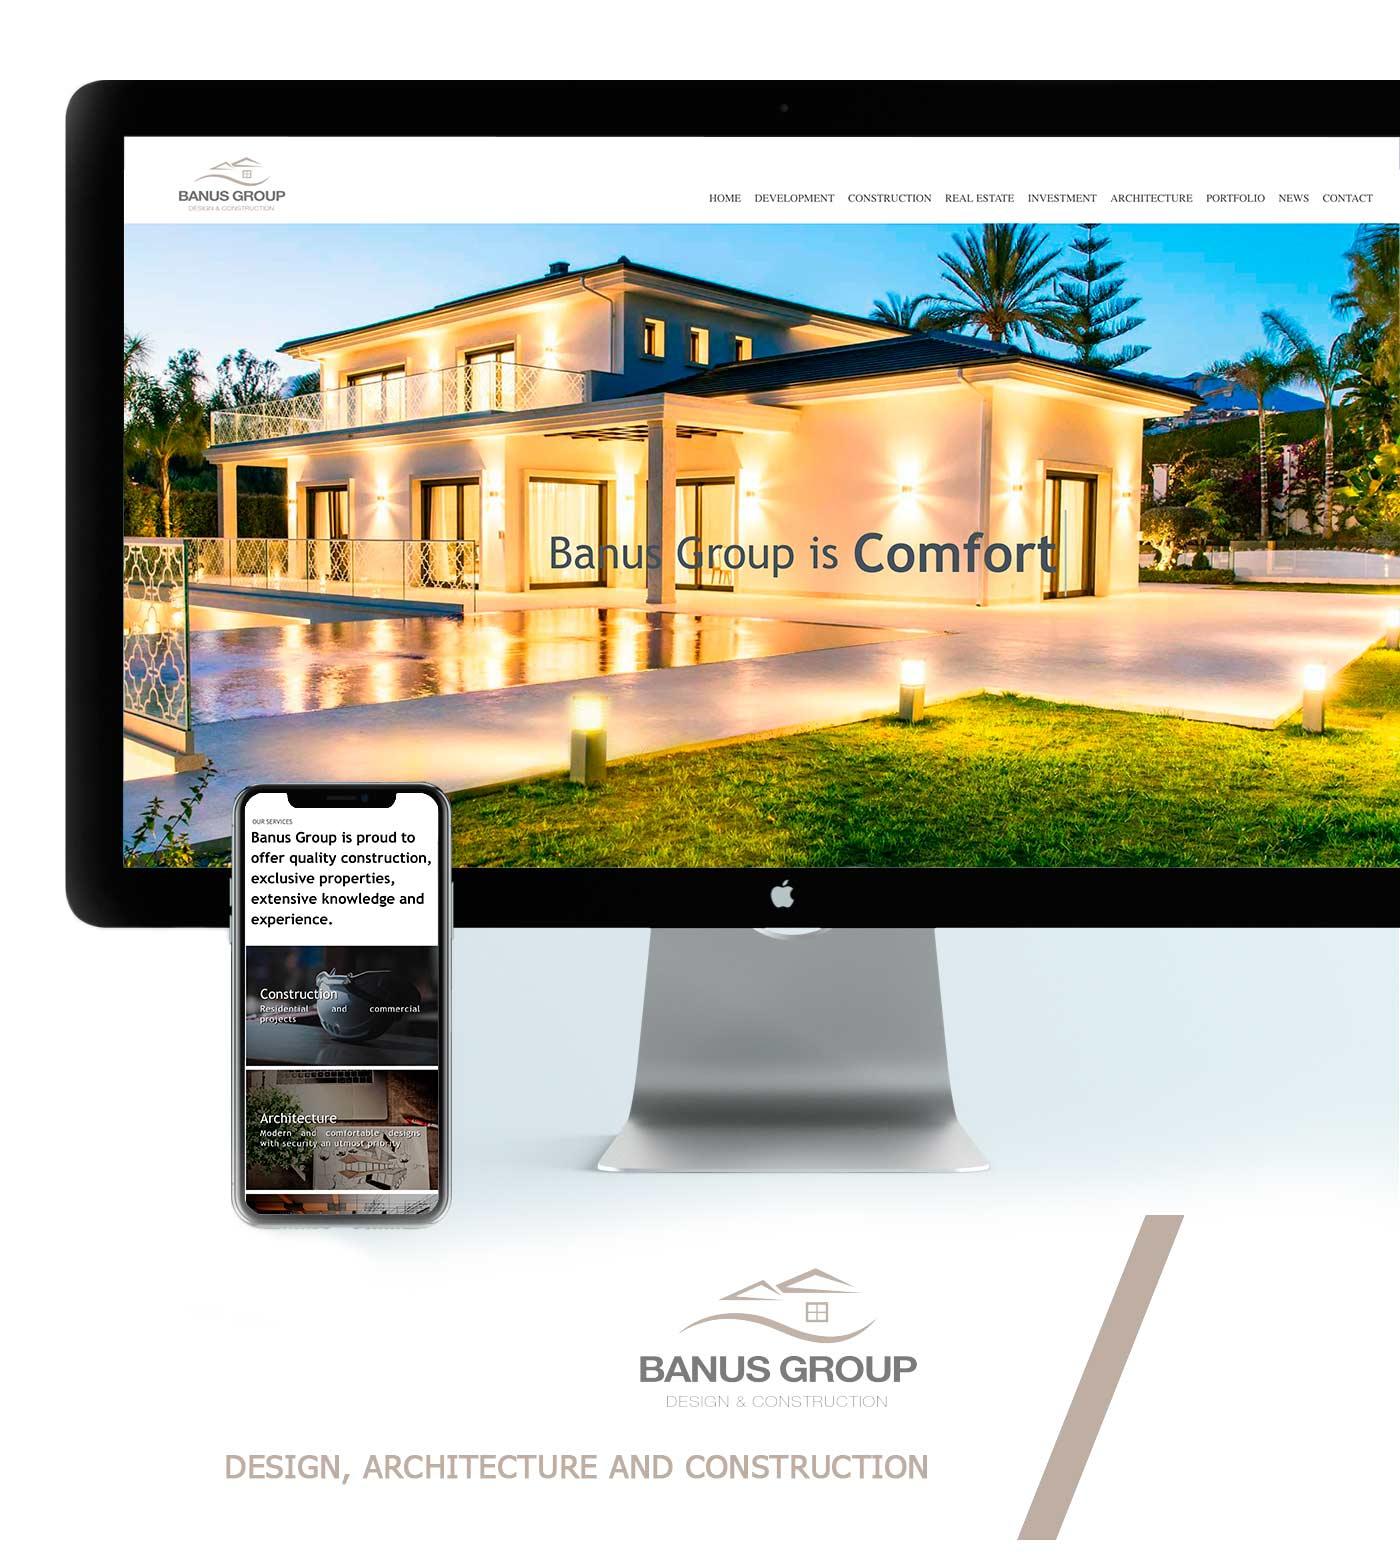 diseño página web inmobiliaria marbella - Real estate Banusgroup